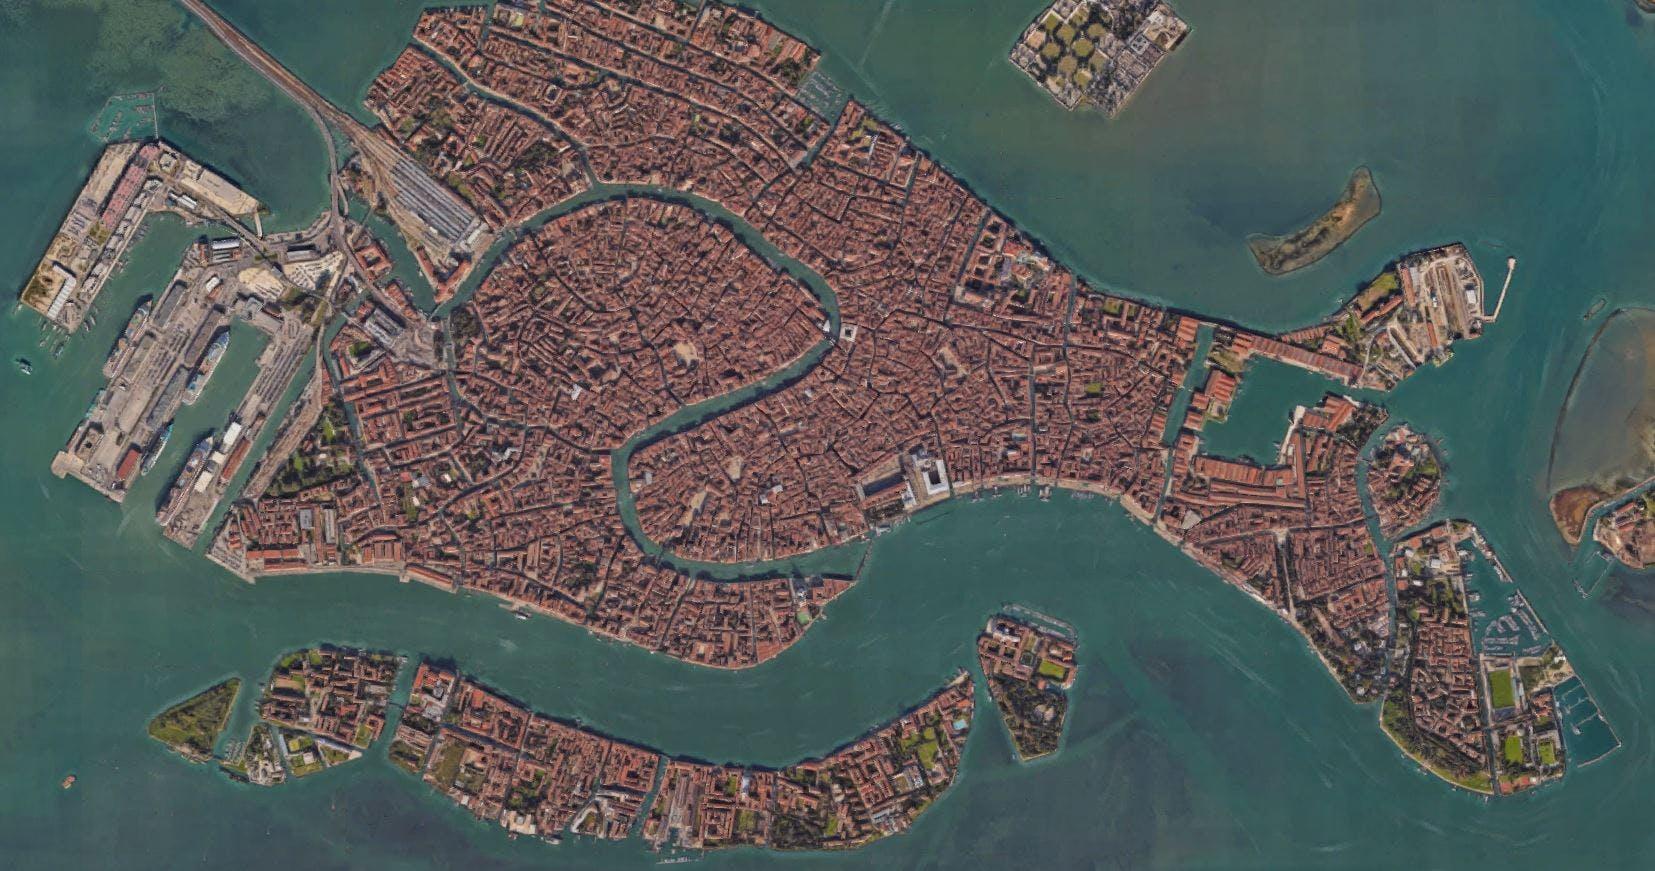 2018 Venice Bienalle Architecttura